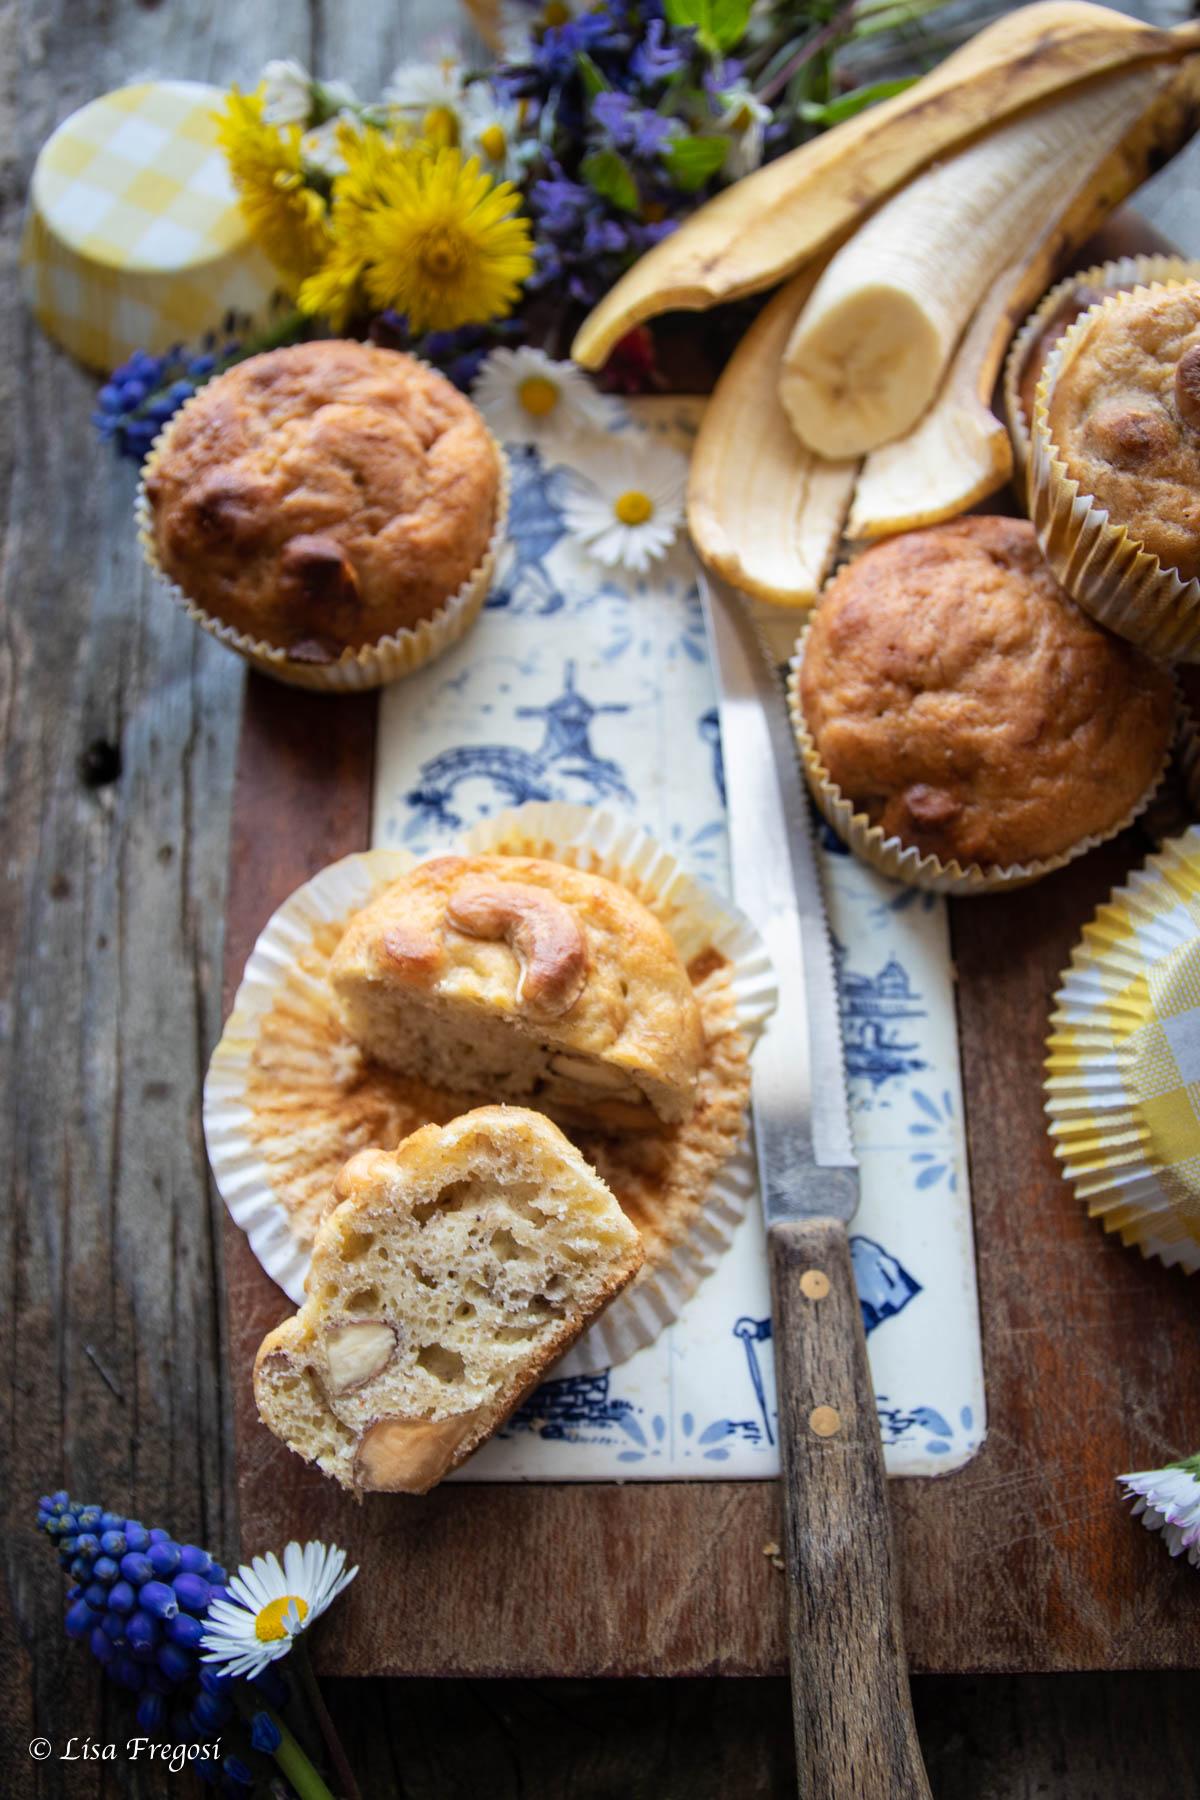 muffin alla banana con noci